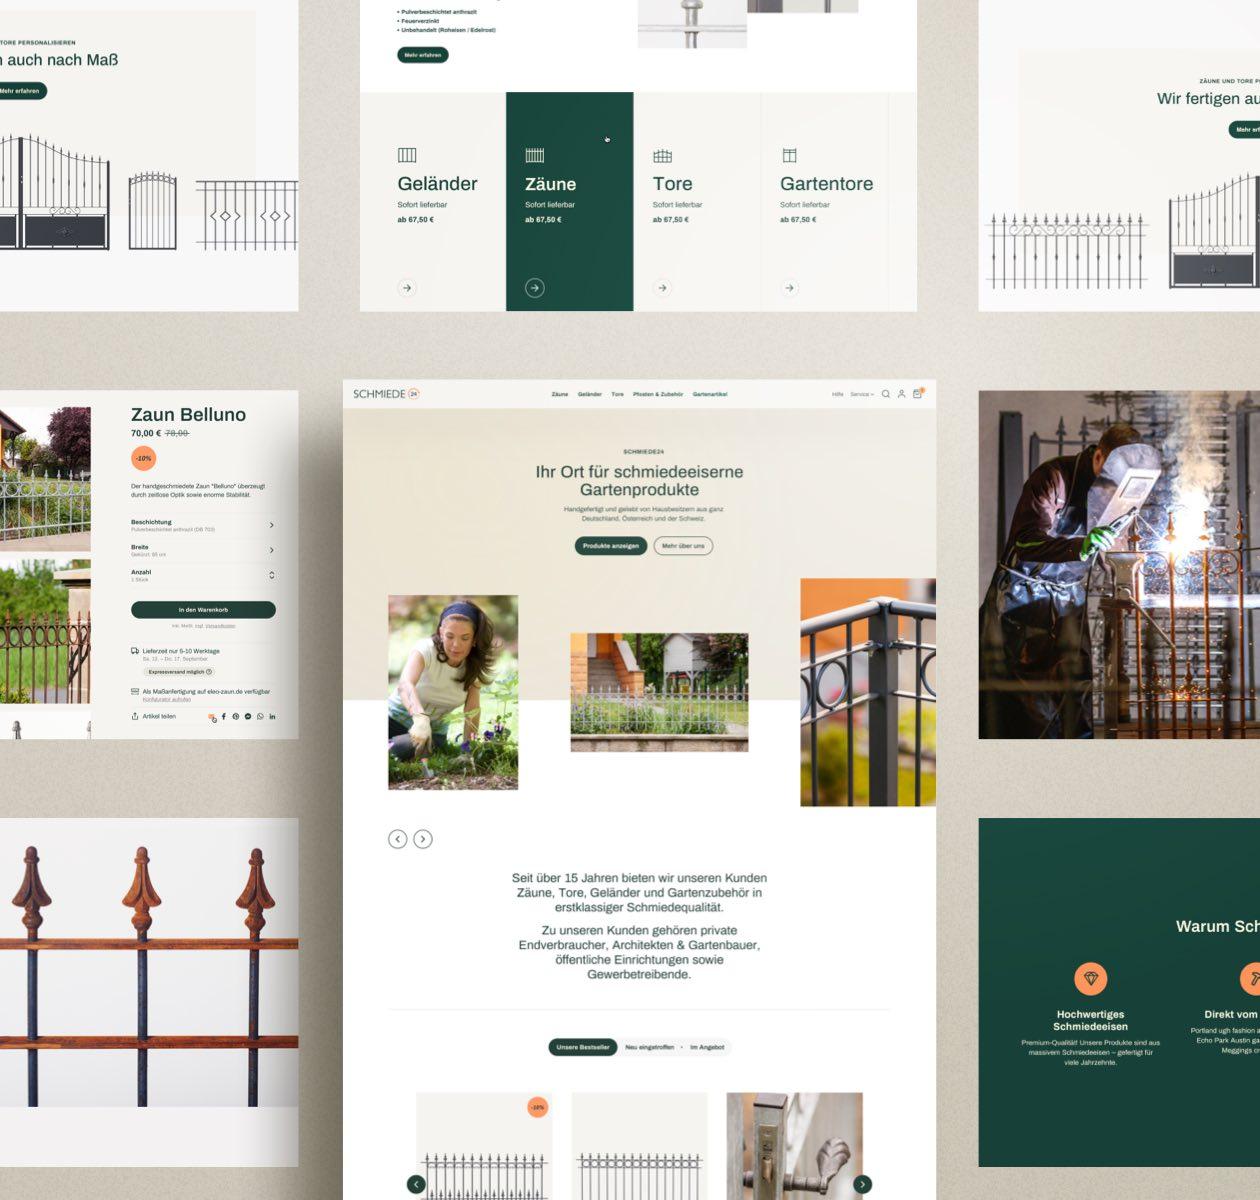 Schmiede24 Website Layout Collage